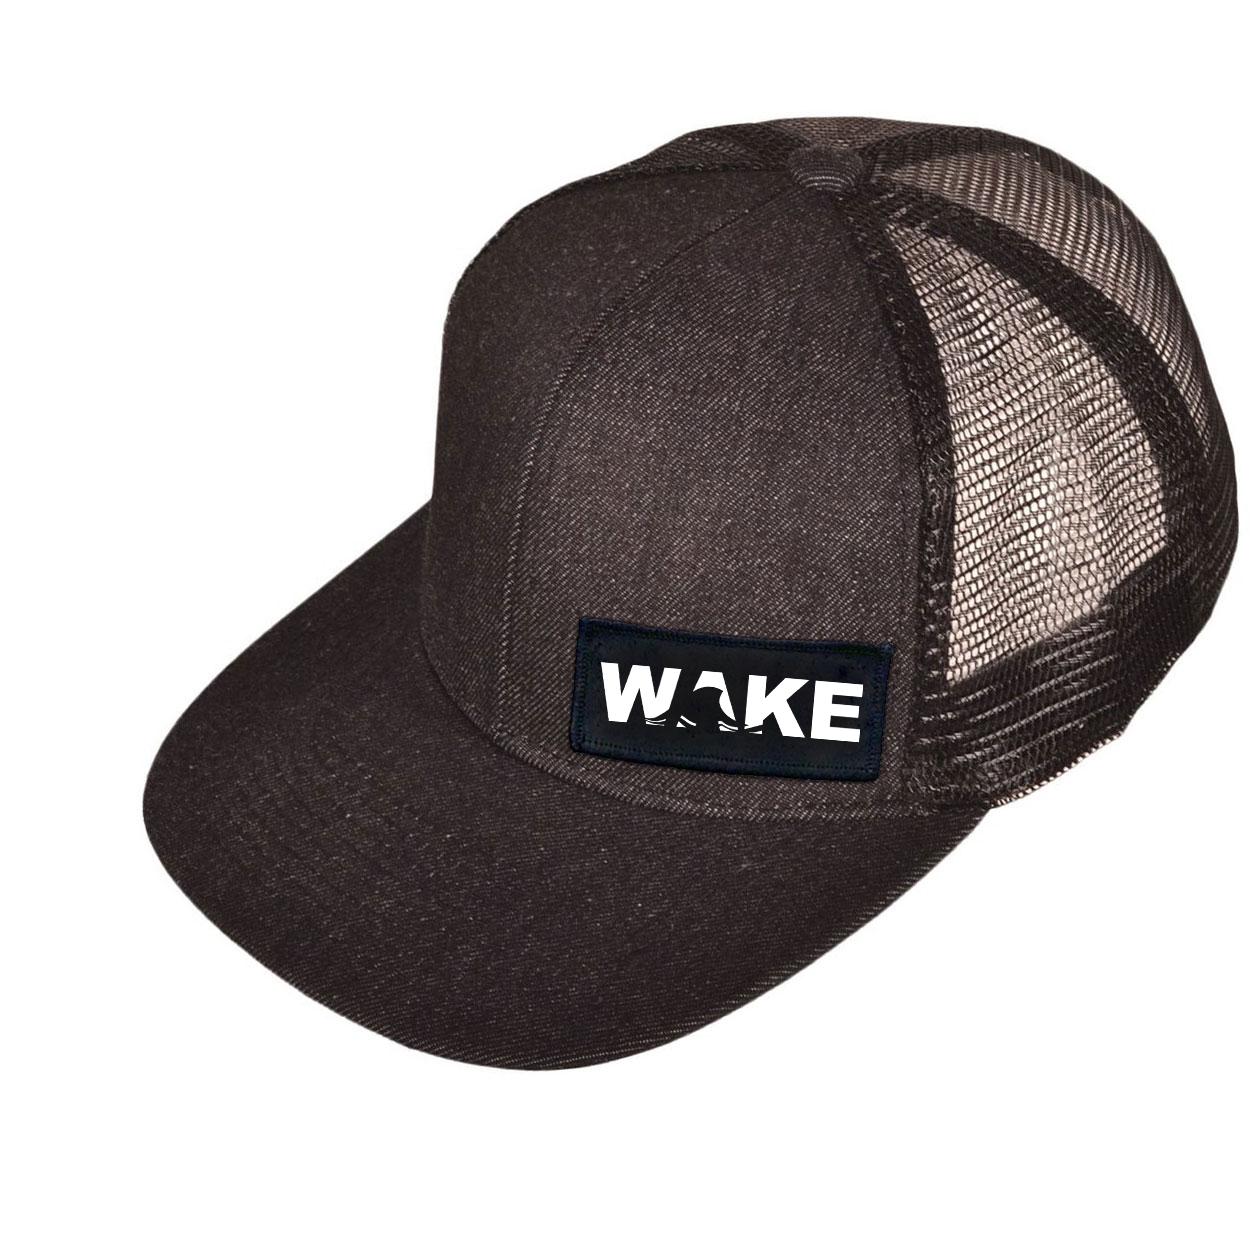 Wake Wave Logo Night Out Woven Patch Snapback Flat Brim Hat Black Denim (White Logo)